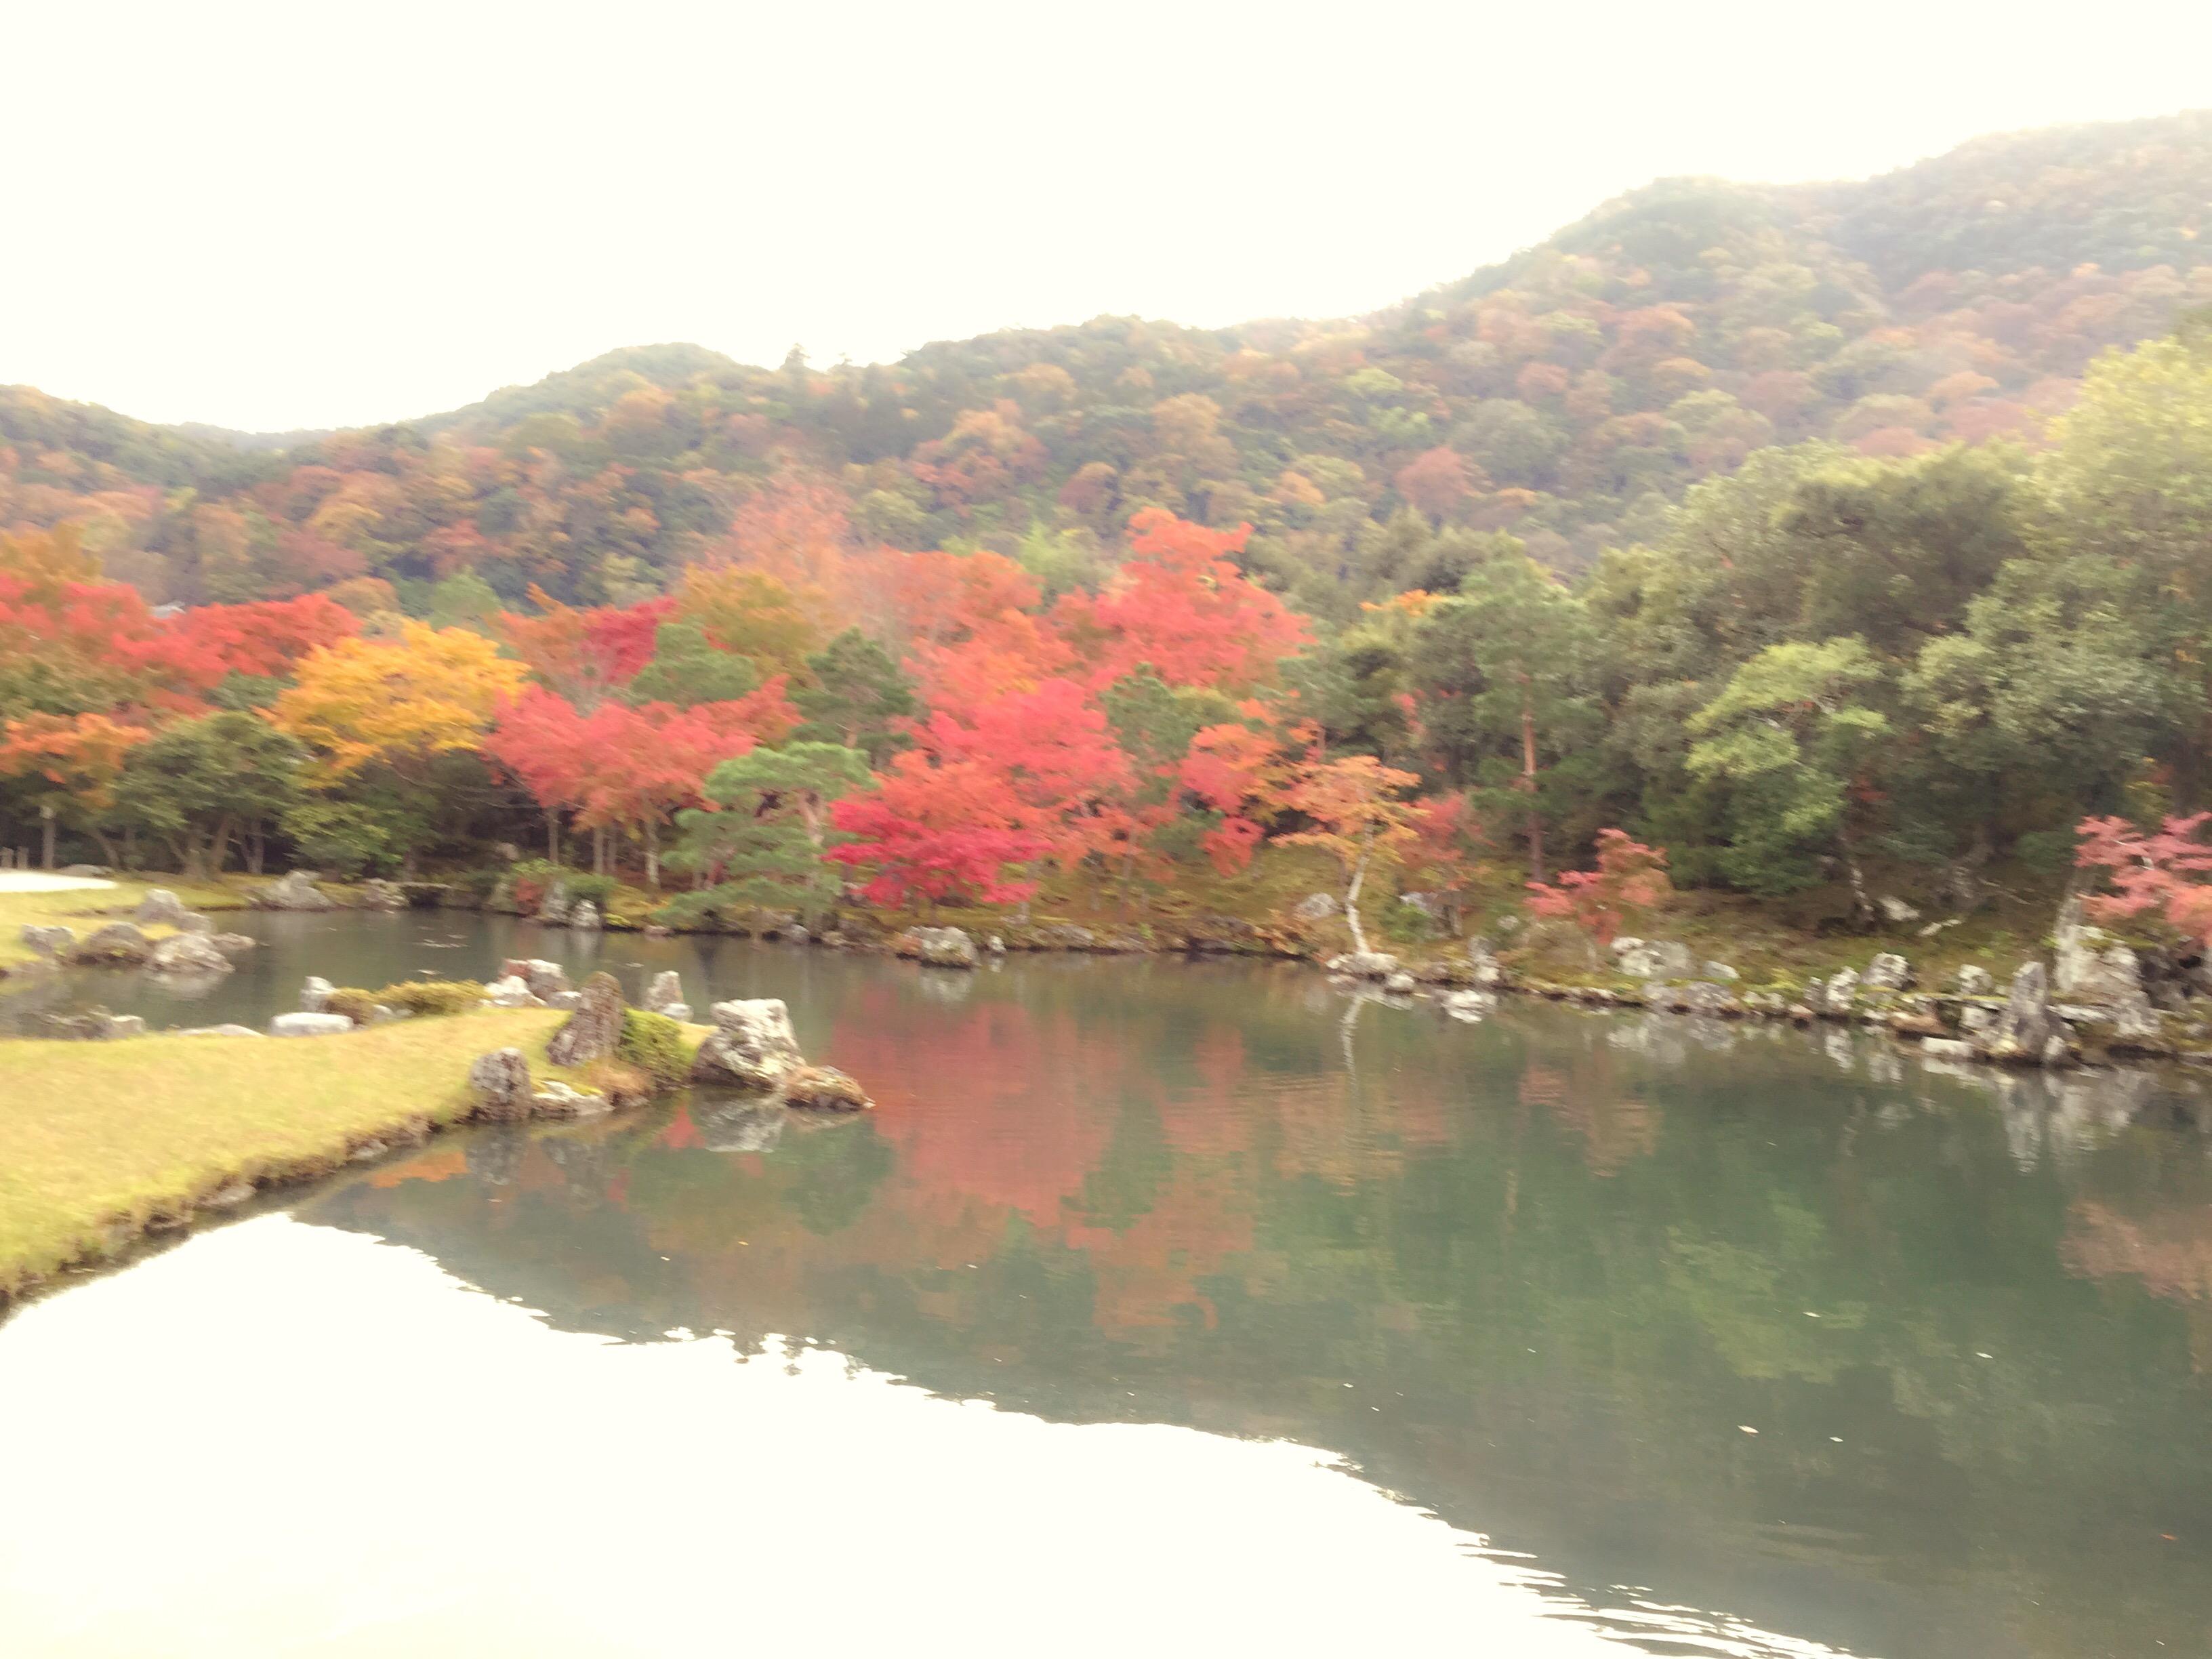 IMG 5435 1 - 京都♡紅葉